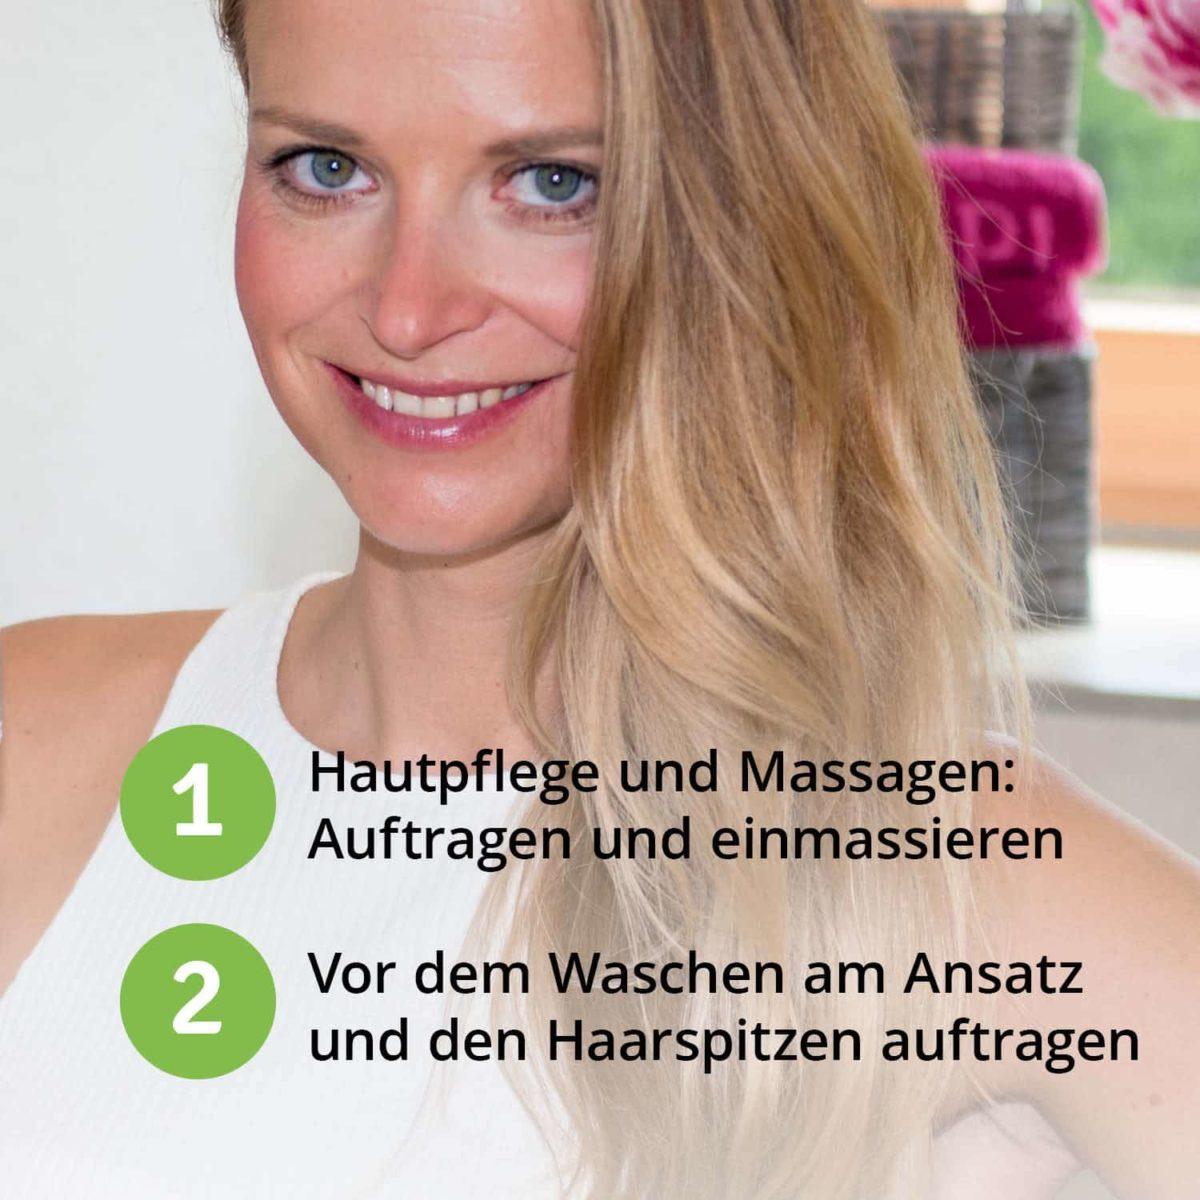 Casida Squalan Öl Haut & Haare – 30 ml 16852202 PZN Apotheke Ölive Massage trockene Haut pflegen natürlich Beauty6